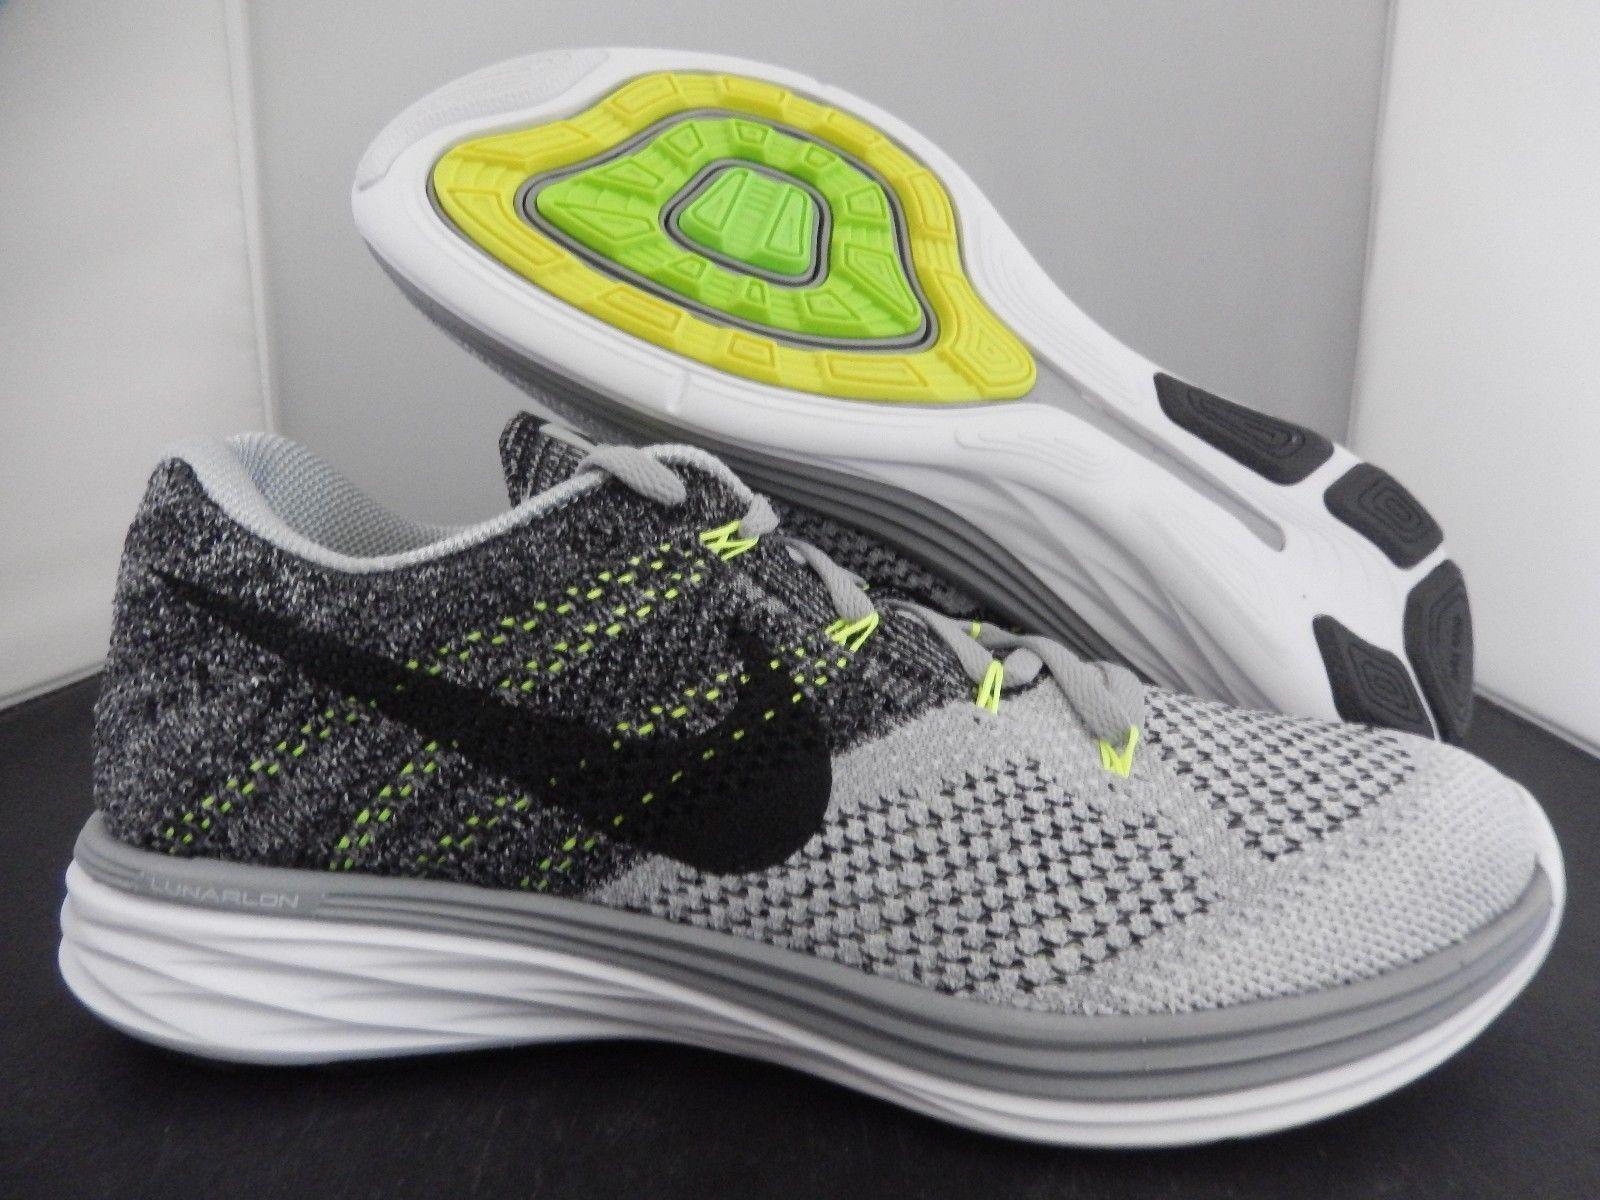 Nike Flyknit Lunar 3 Wolf Grey Black White Volt 698181 009 Nike Flyknit Lunar 3 Nike Lunar Flyknit Lunar